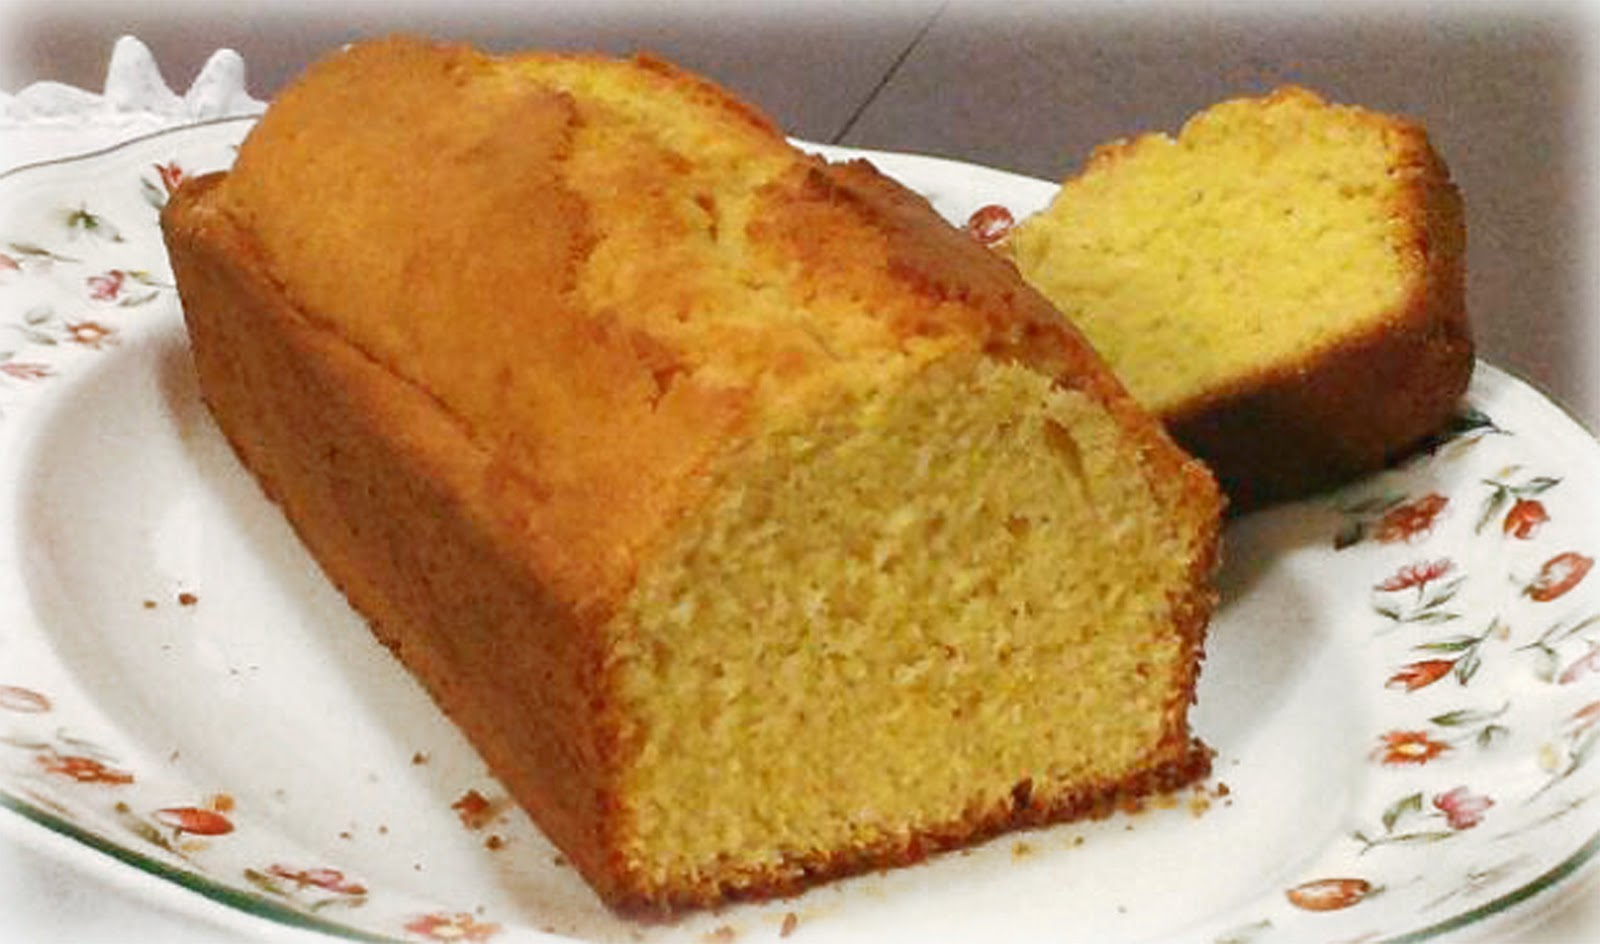 http://recetasoriginalesblog.blogspot.com.es/2015/02/bizcocho-naranja-mantequilla.html